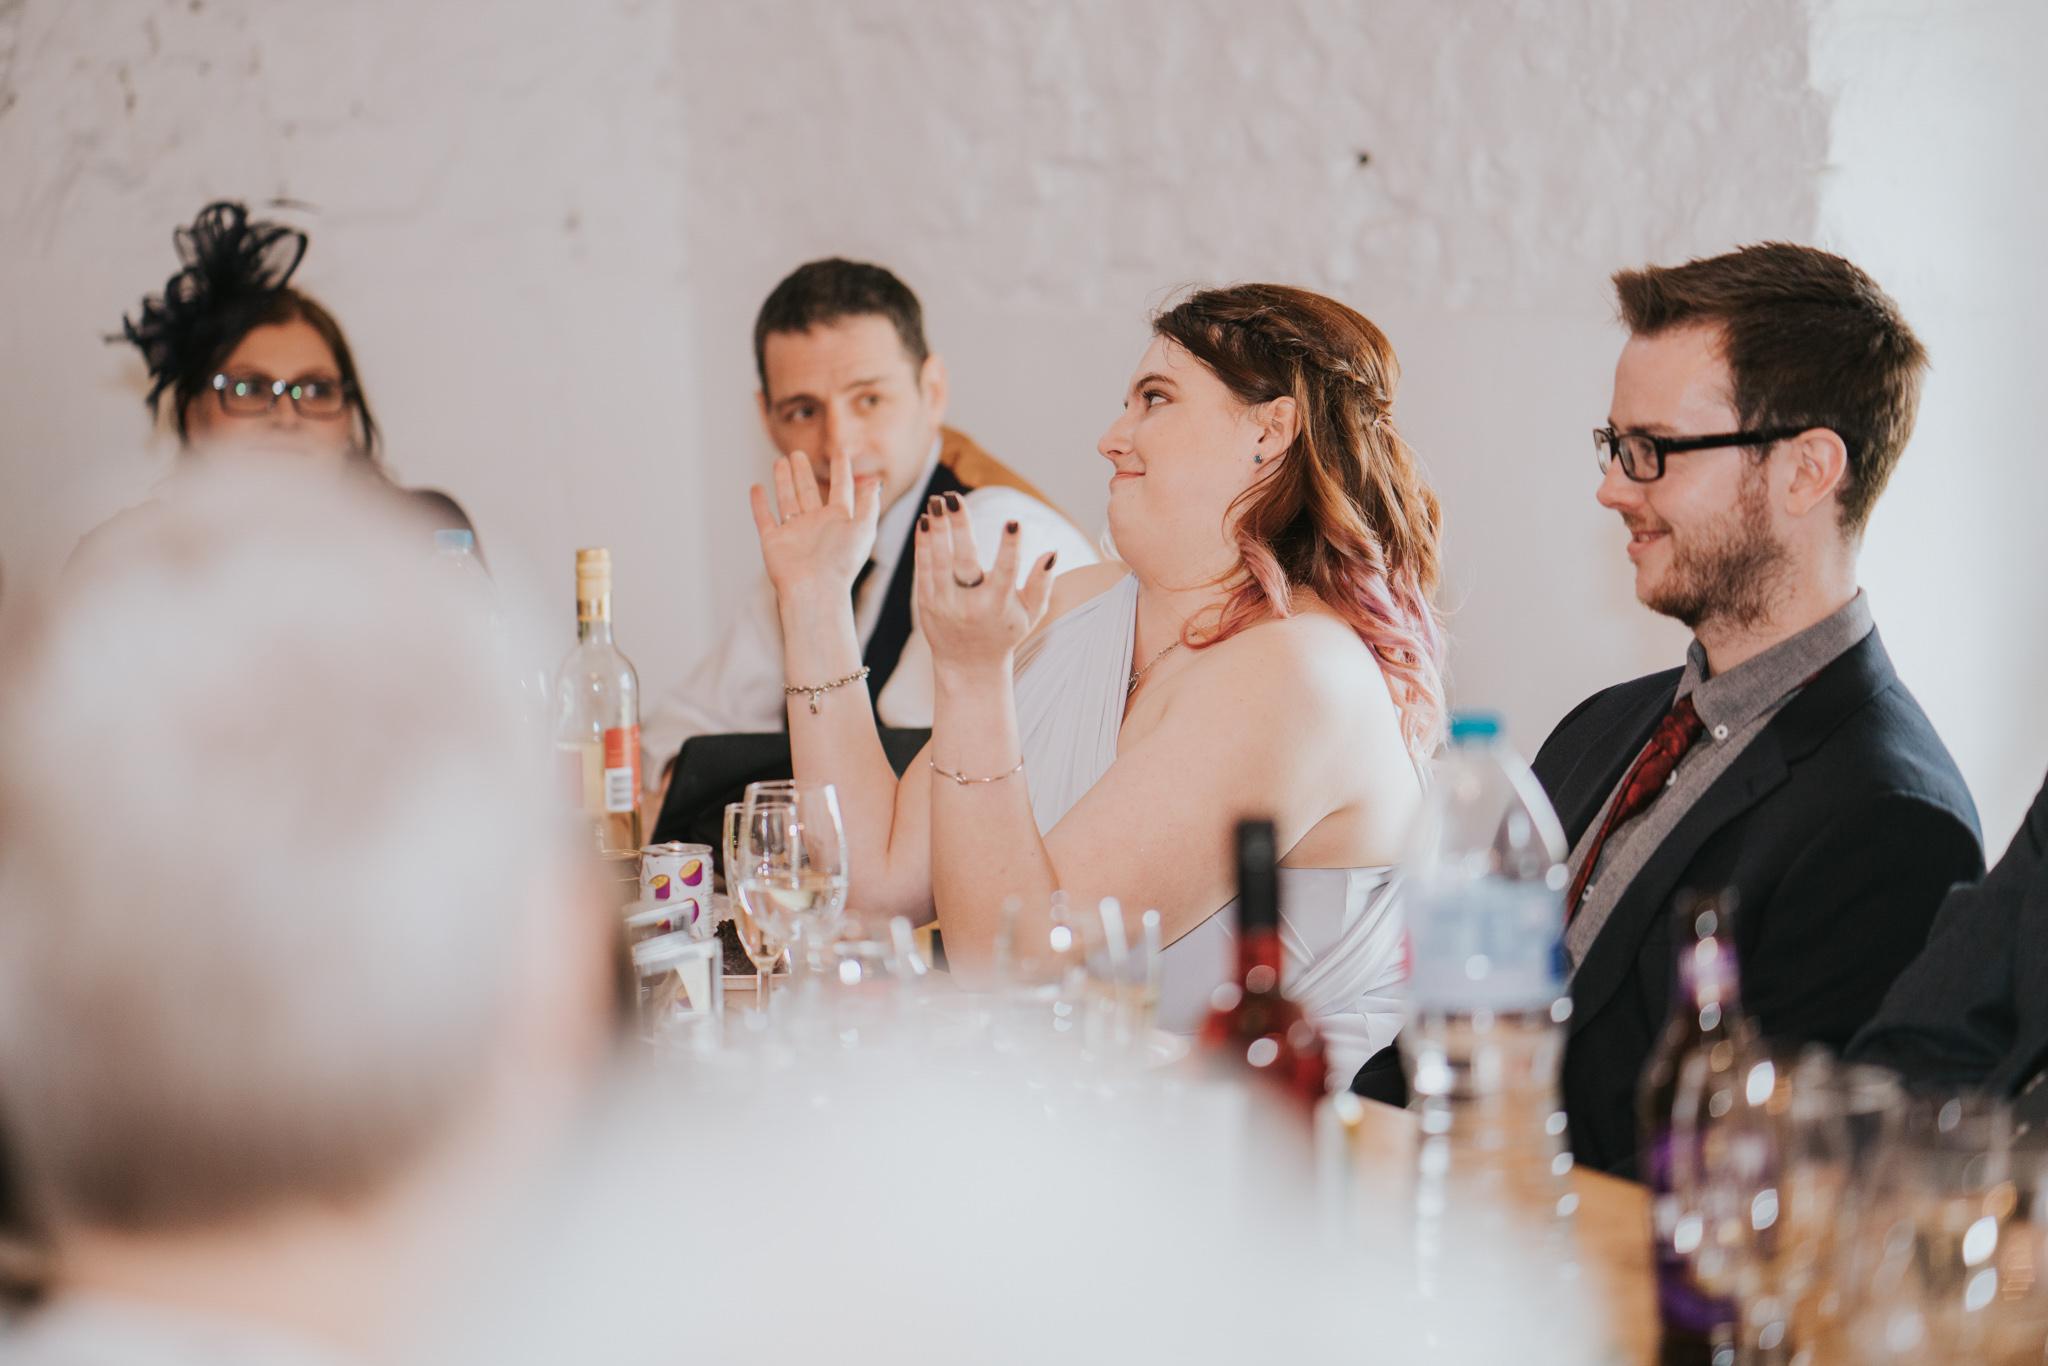 grace-sam-old-barn-clovelly-devon-wedding-photographer-grace-elizabeth-essex-suffolk-norfolk-wedding-photographer (85 of 132).jpg